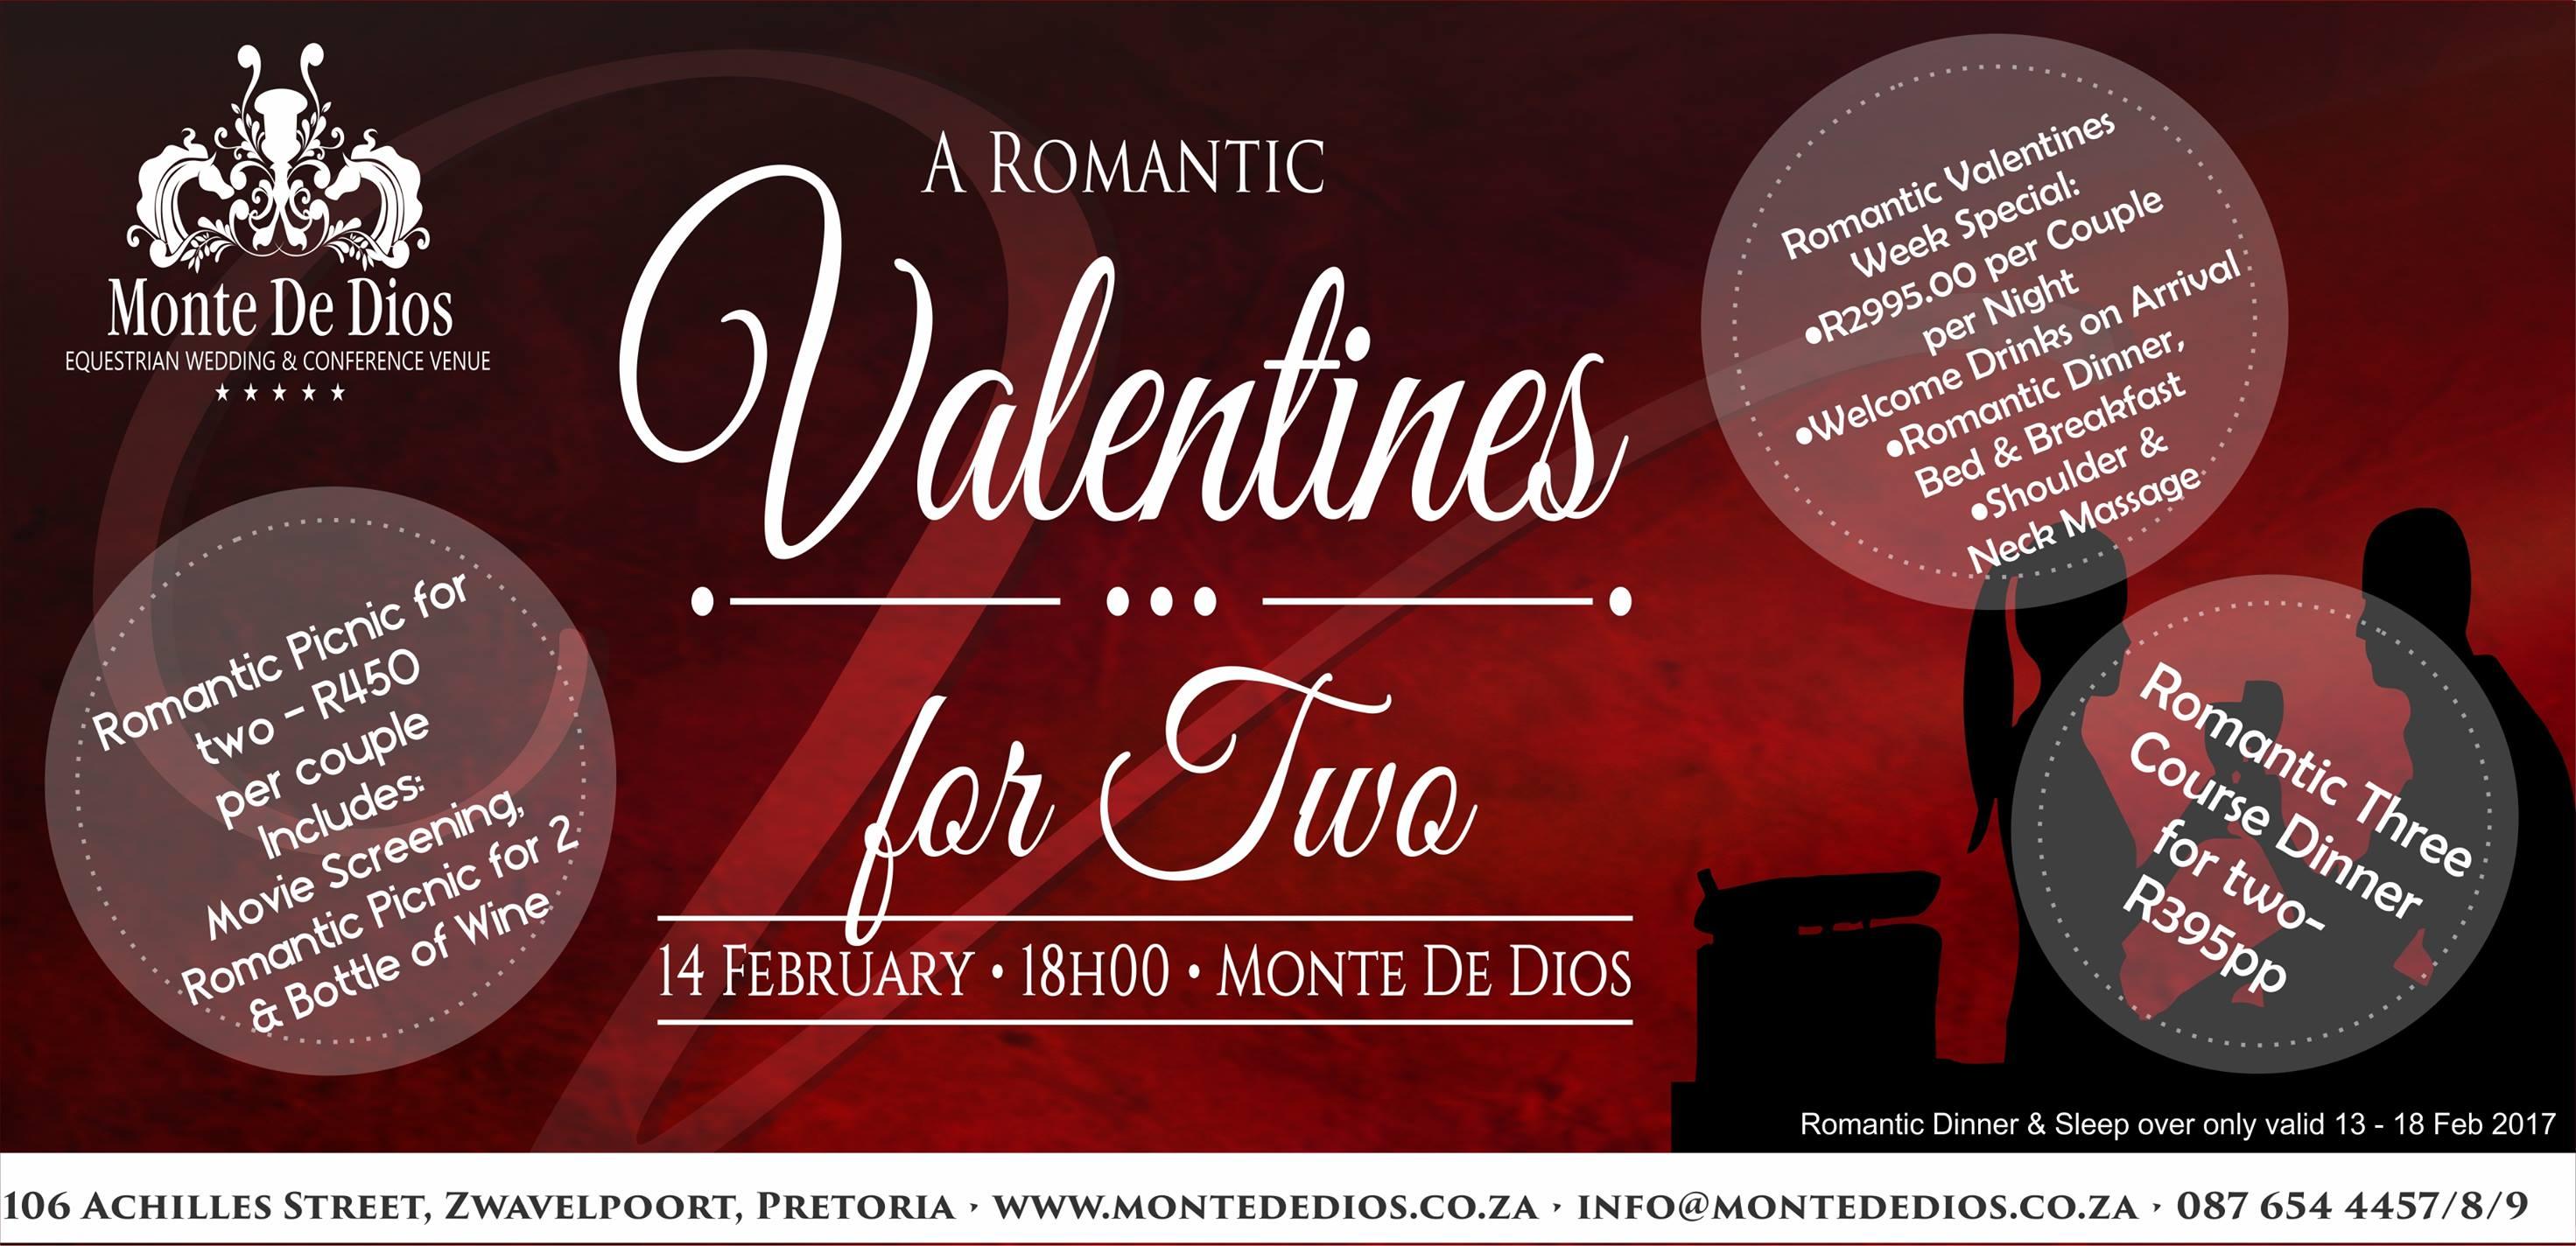 Romantic Valentine's 2017 for Two - Monte de Dios - Zwavelpoort